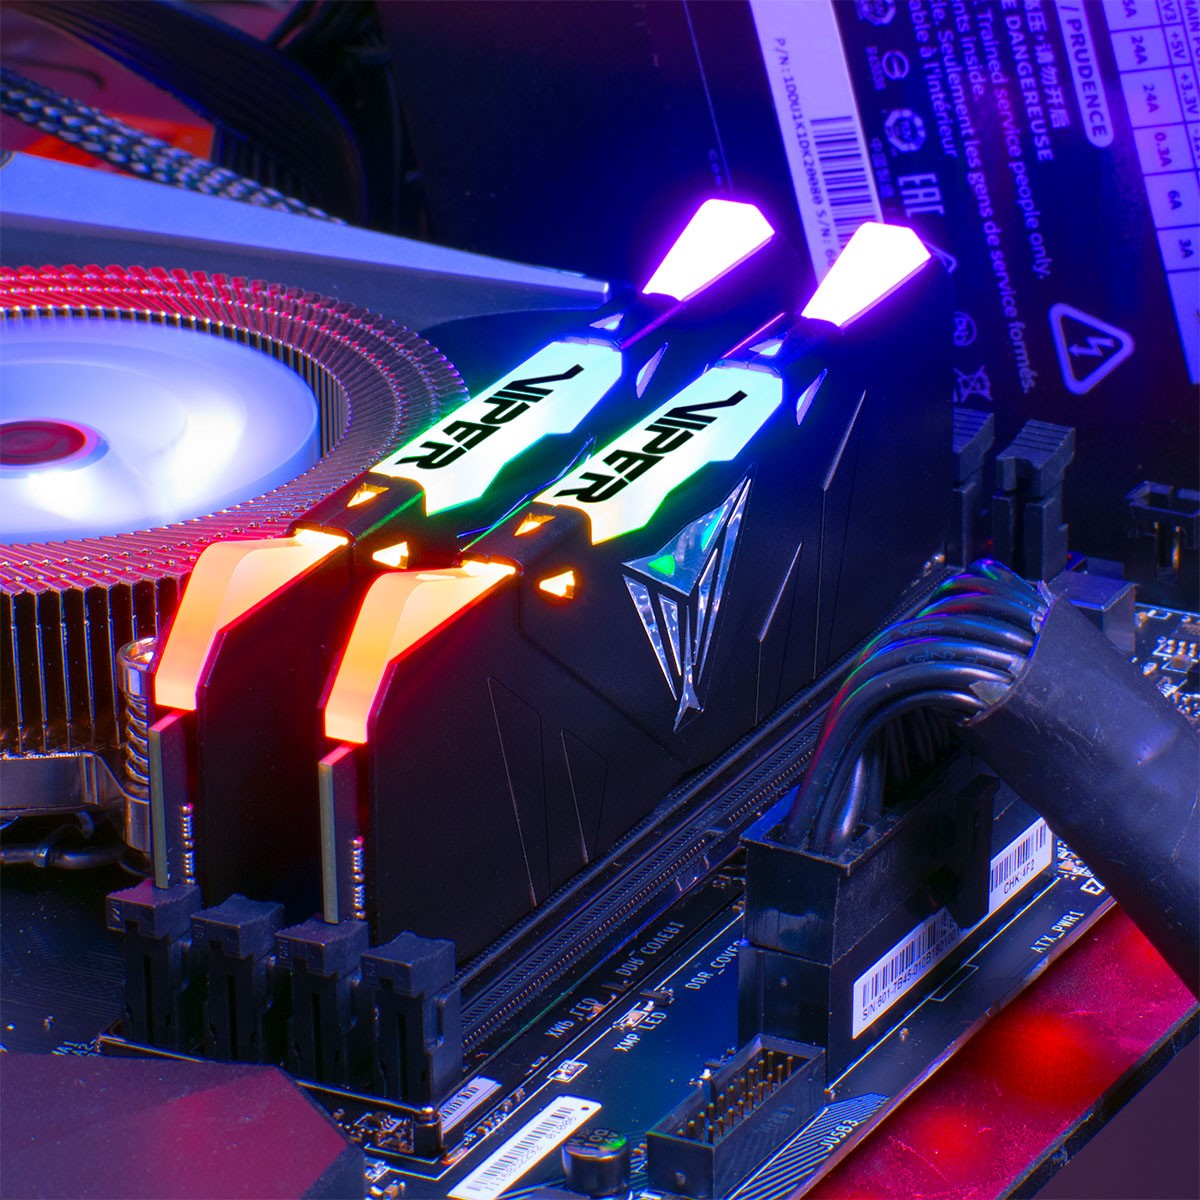 Memória Gamer Patriot Viper RGB, 16GB (Kit 2x 8GB), DDR4, 3000MHz, CL15, Preto, PVR416G300C5K